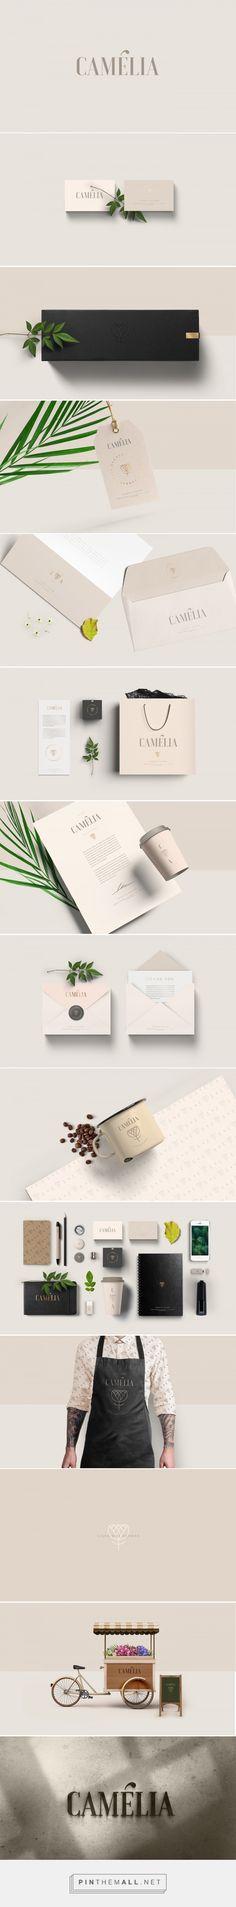 Camélia Florist Branding by Estudio Alice | Fivestar Branding Agency – Design and Branding Agency & Curated Inspiration Gallery